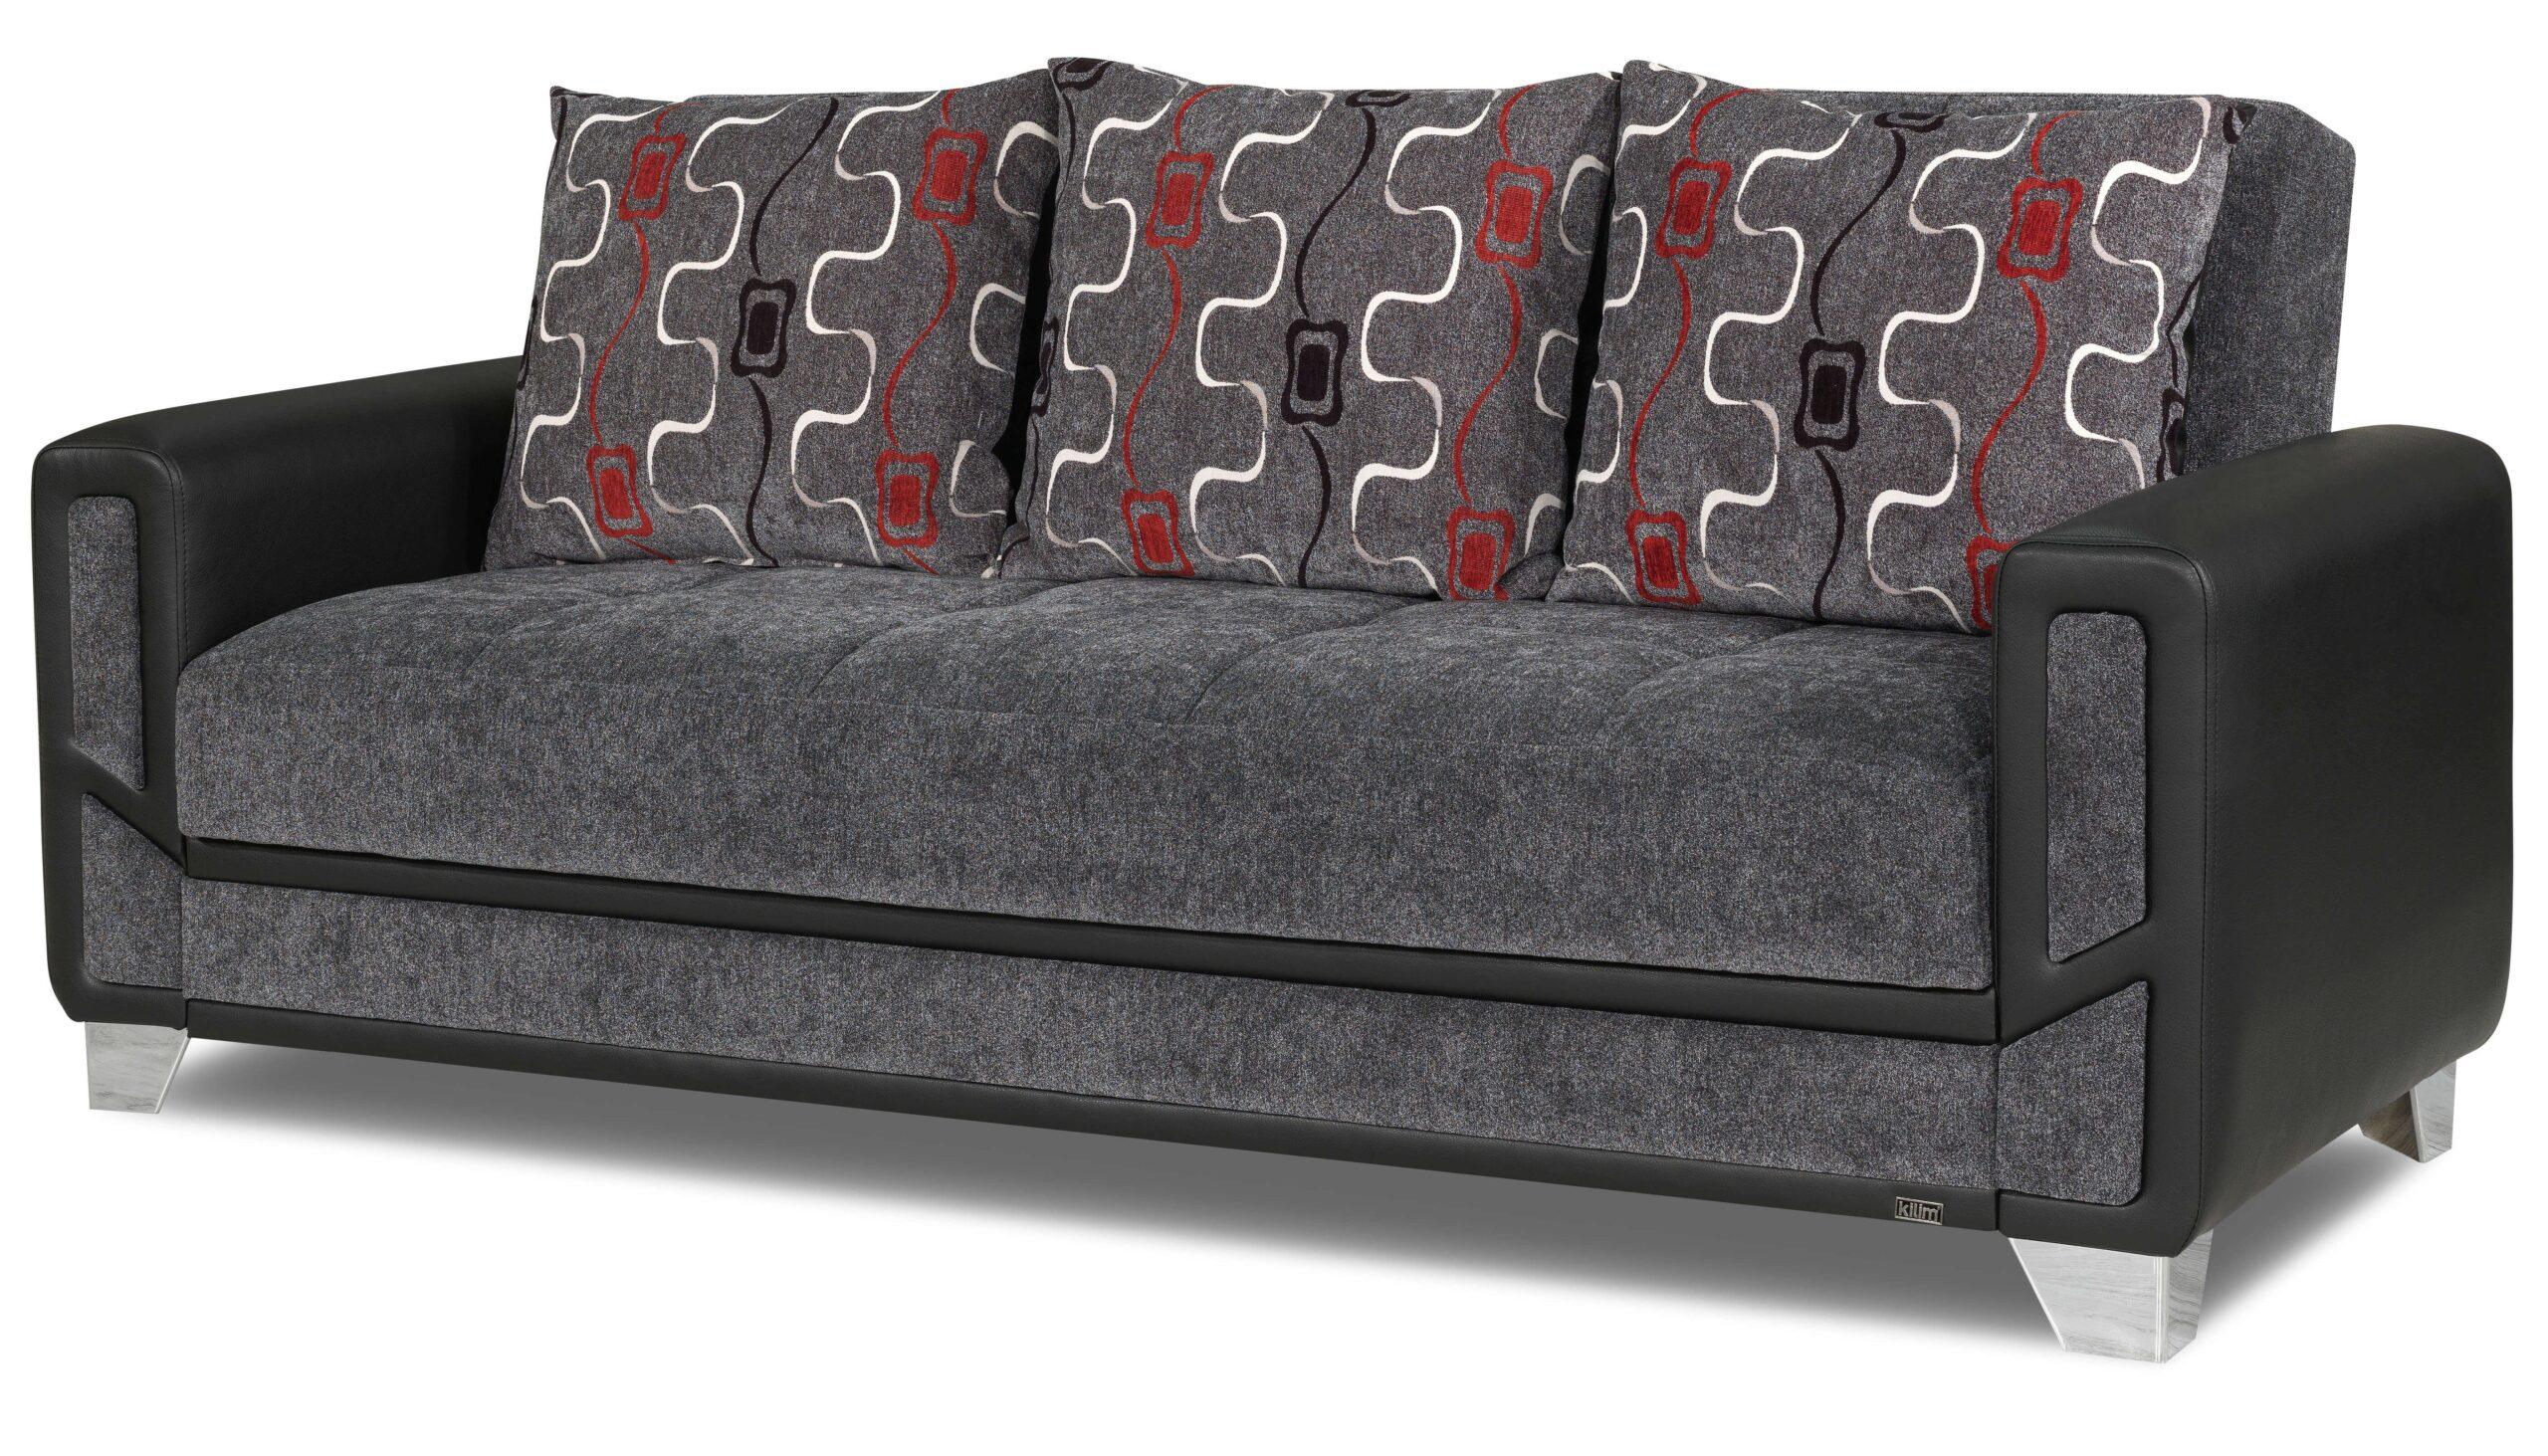 Full Size of Mondo Sofa Kaufen Capocolle 3 Agata Meble Group Srl Online Leder Bertinoro Bed Softline Orari Couch 2 Erfahrungen Brick 1 Modern Sitzer Husse Dreisitzer Sofa Mondo Sofa